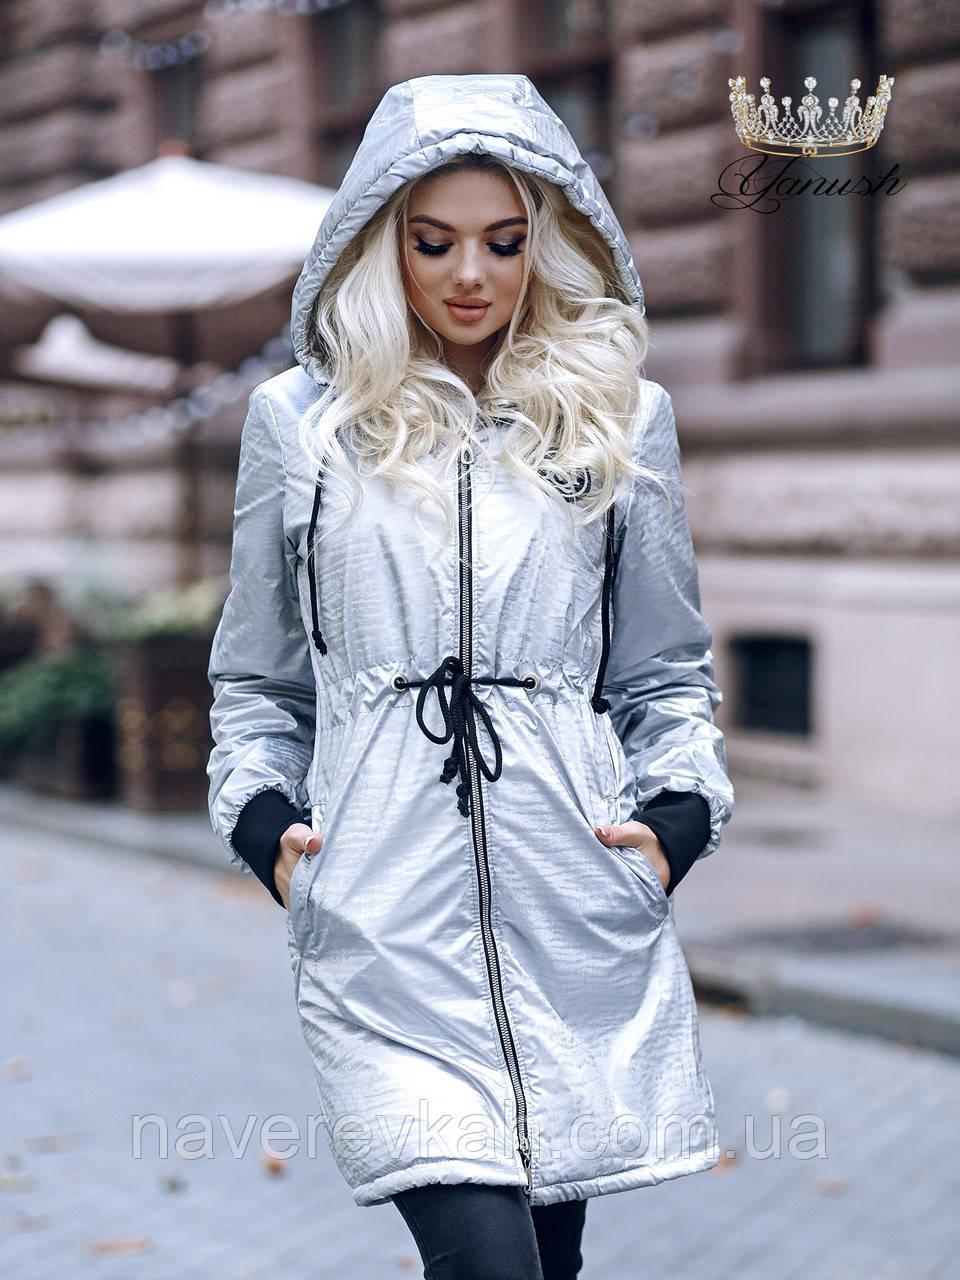 Женская осенняя куртка парка плащевка овчина хаки черное синее марсала горчица оливка серебро меланж С М Л